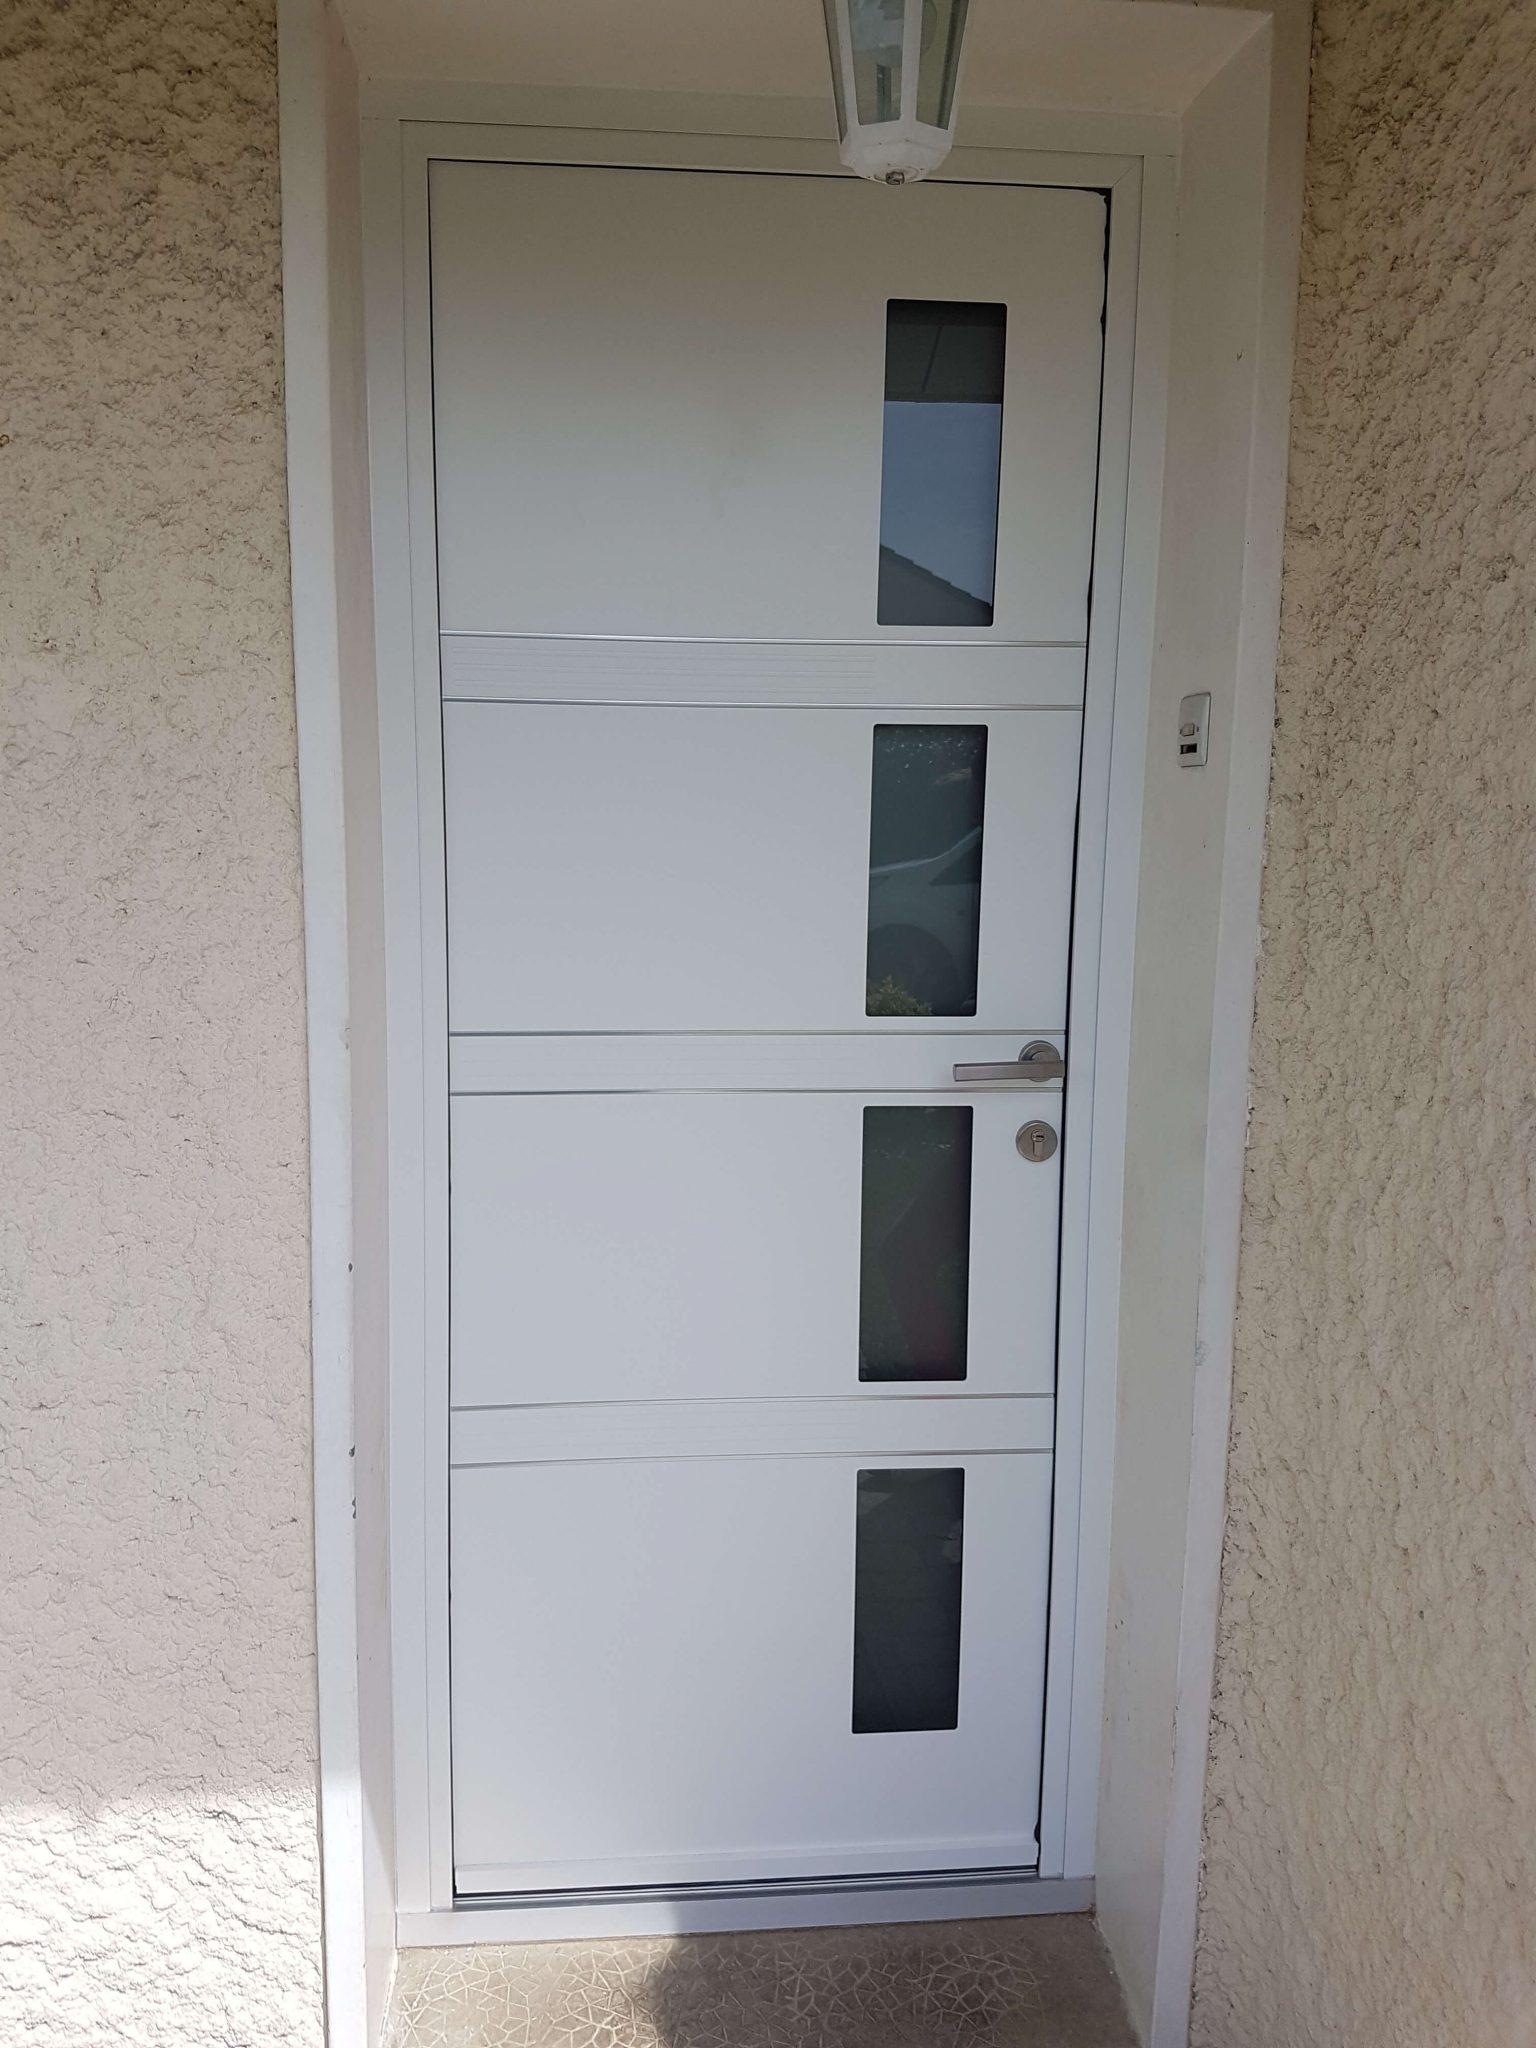 Porte K line modèle quadrige blanc intérieurextérieur - GCDH installe une porte K-LINE modèle quadrige !